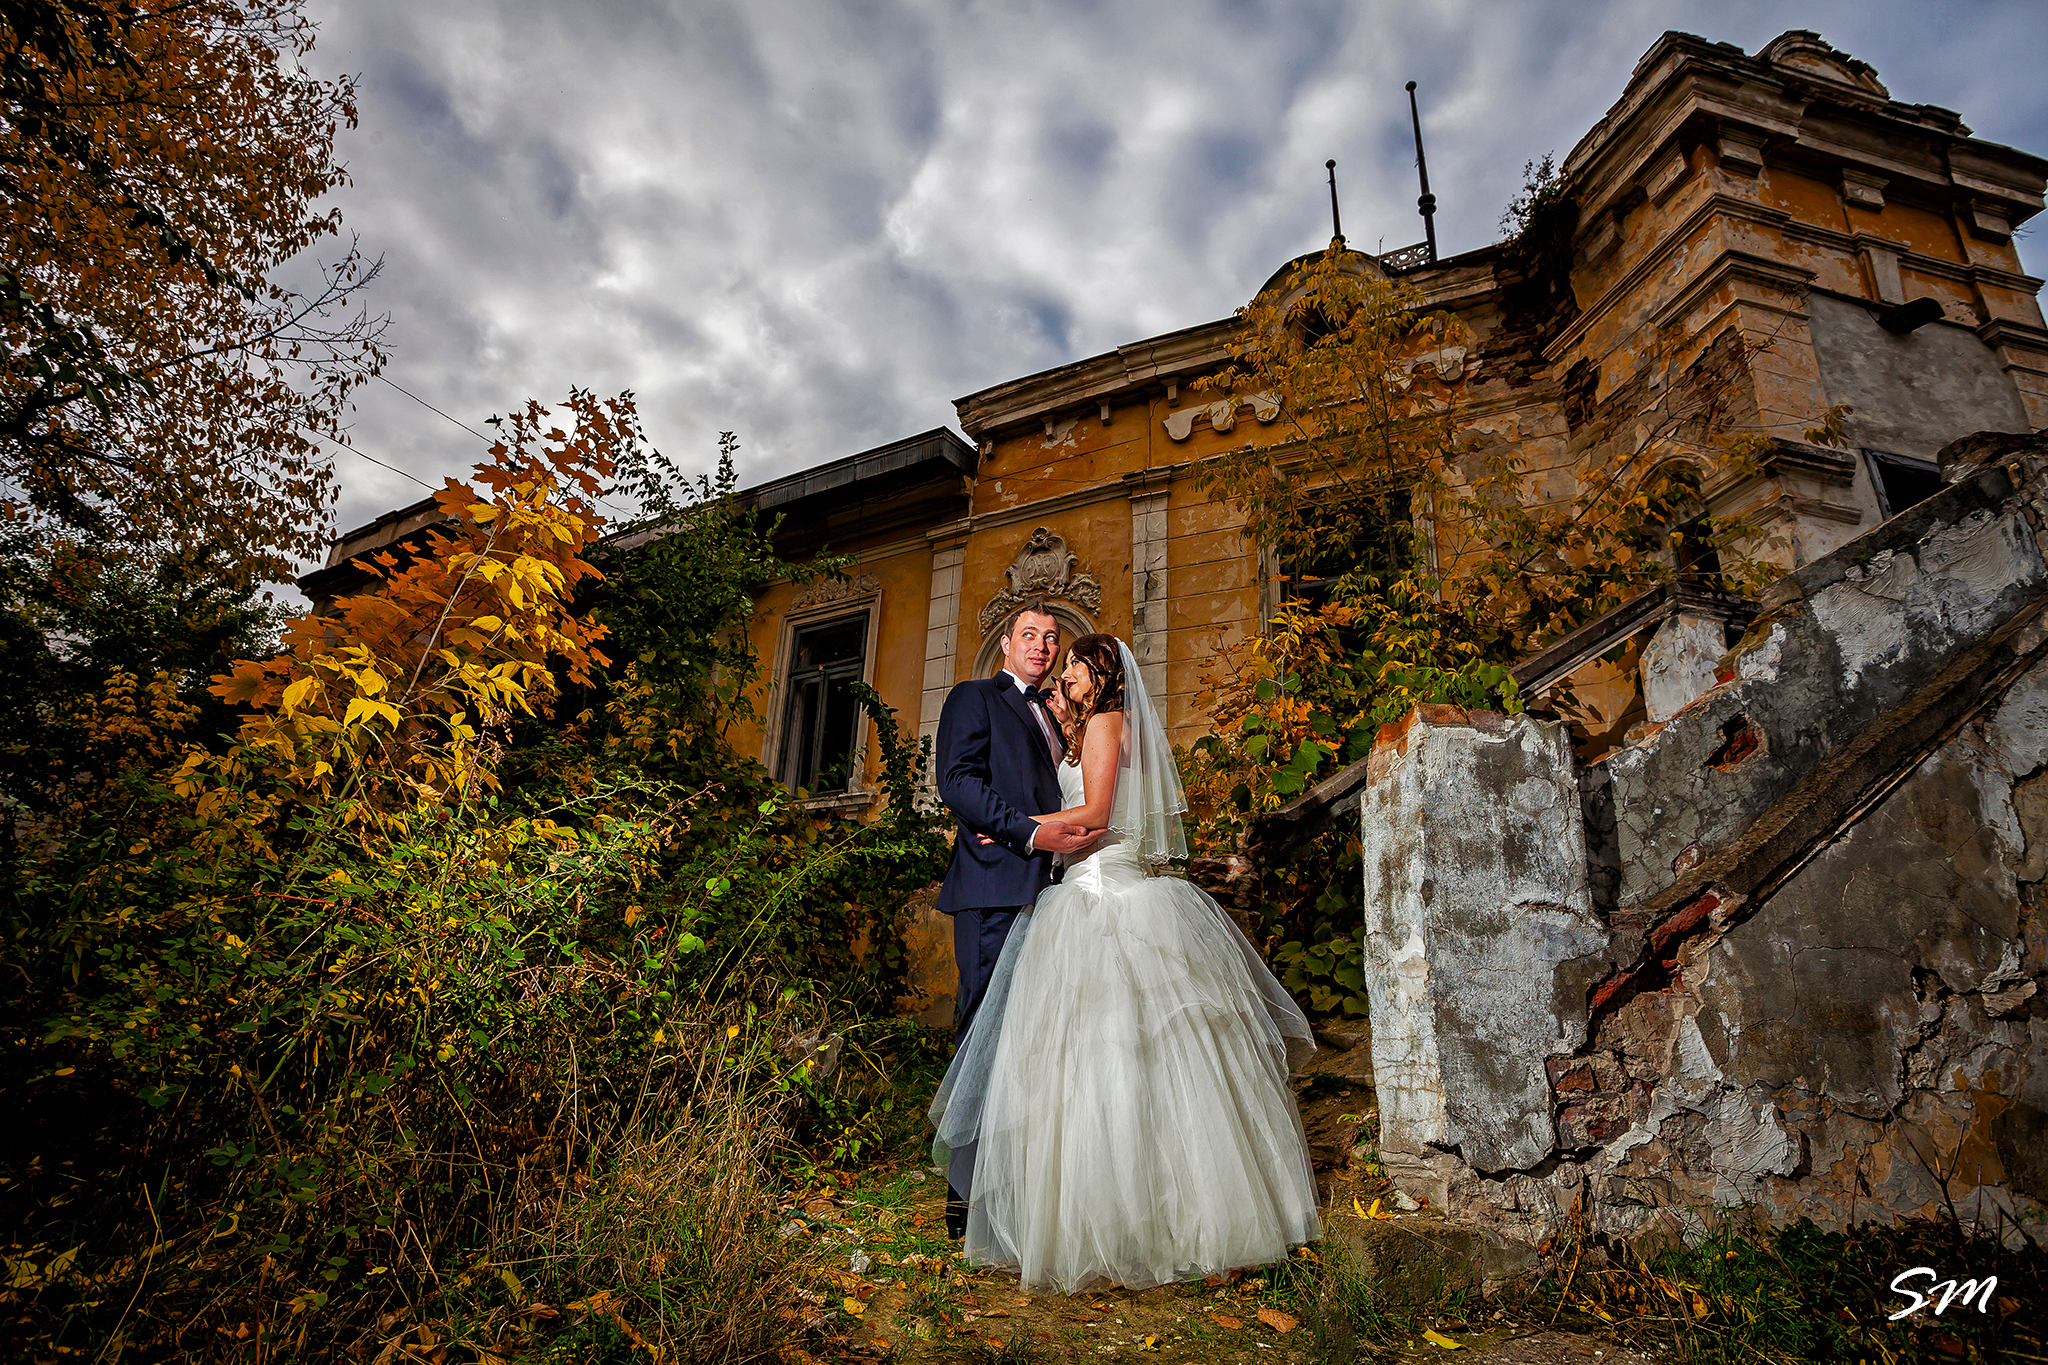 fotograf_nunta_profesionist_suceava (12)